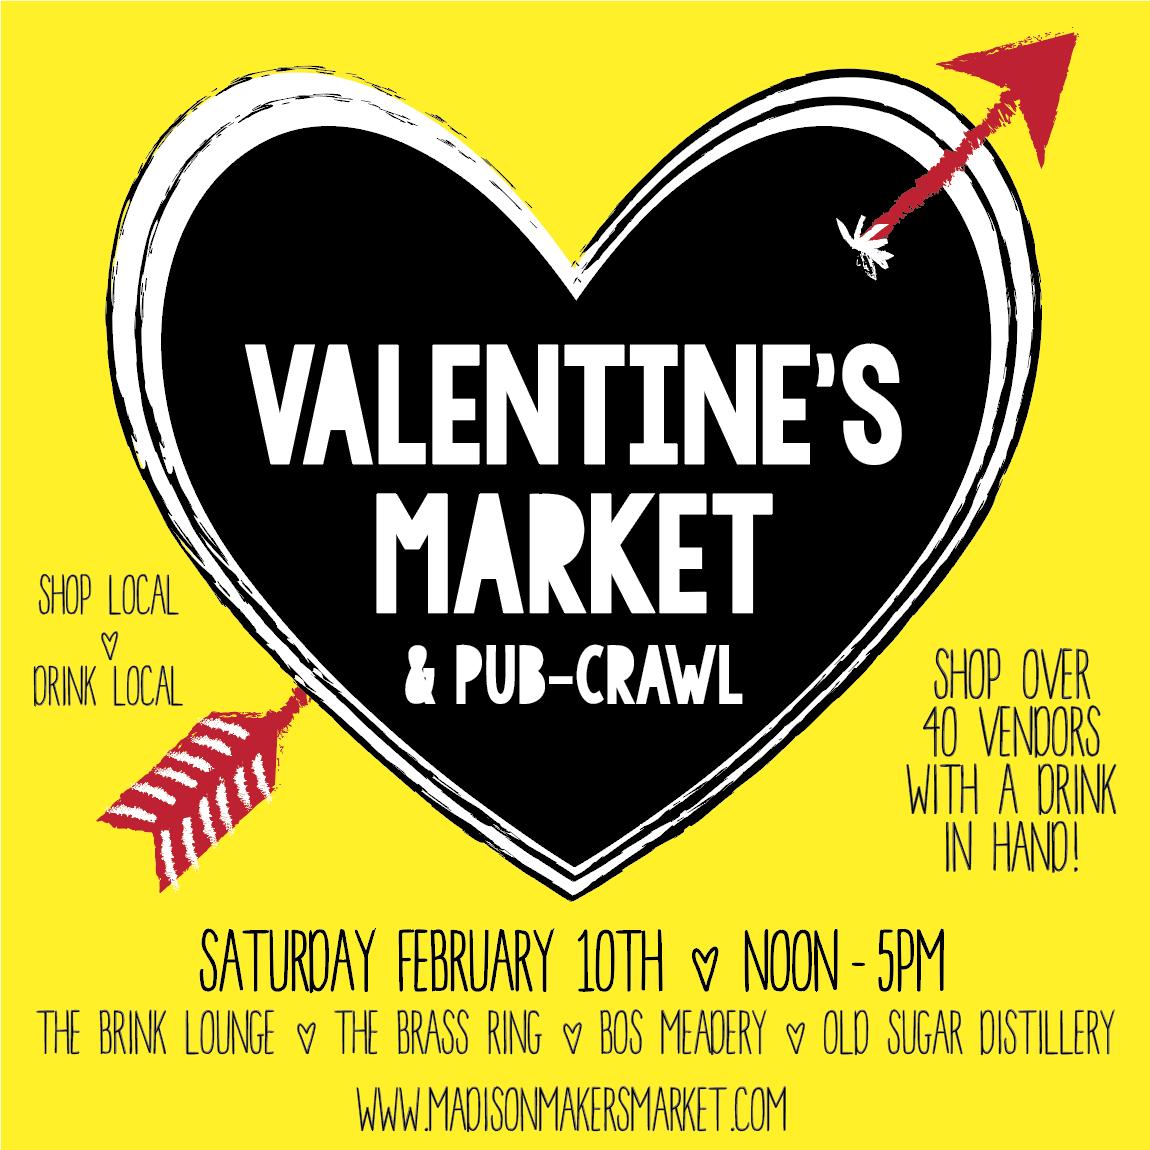 Valentine's Market & Pub-Crawl MADISON MAKERS